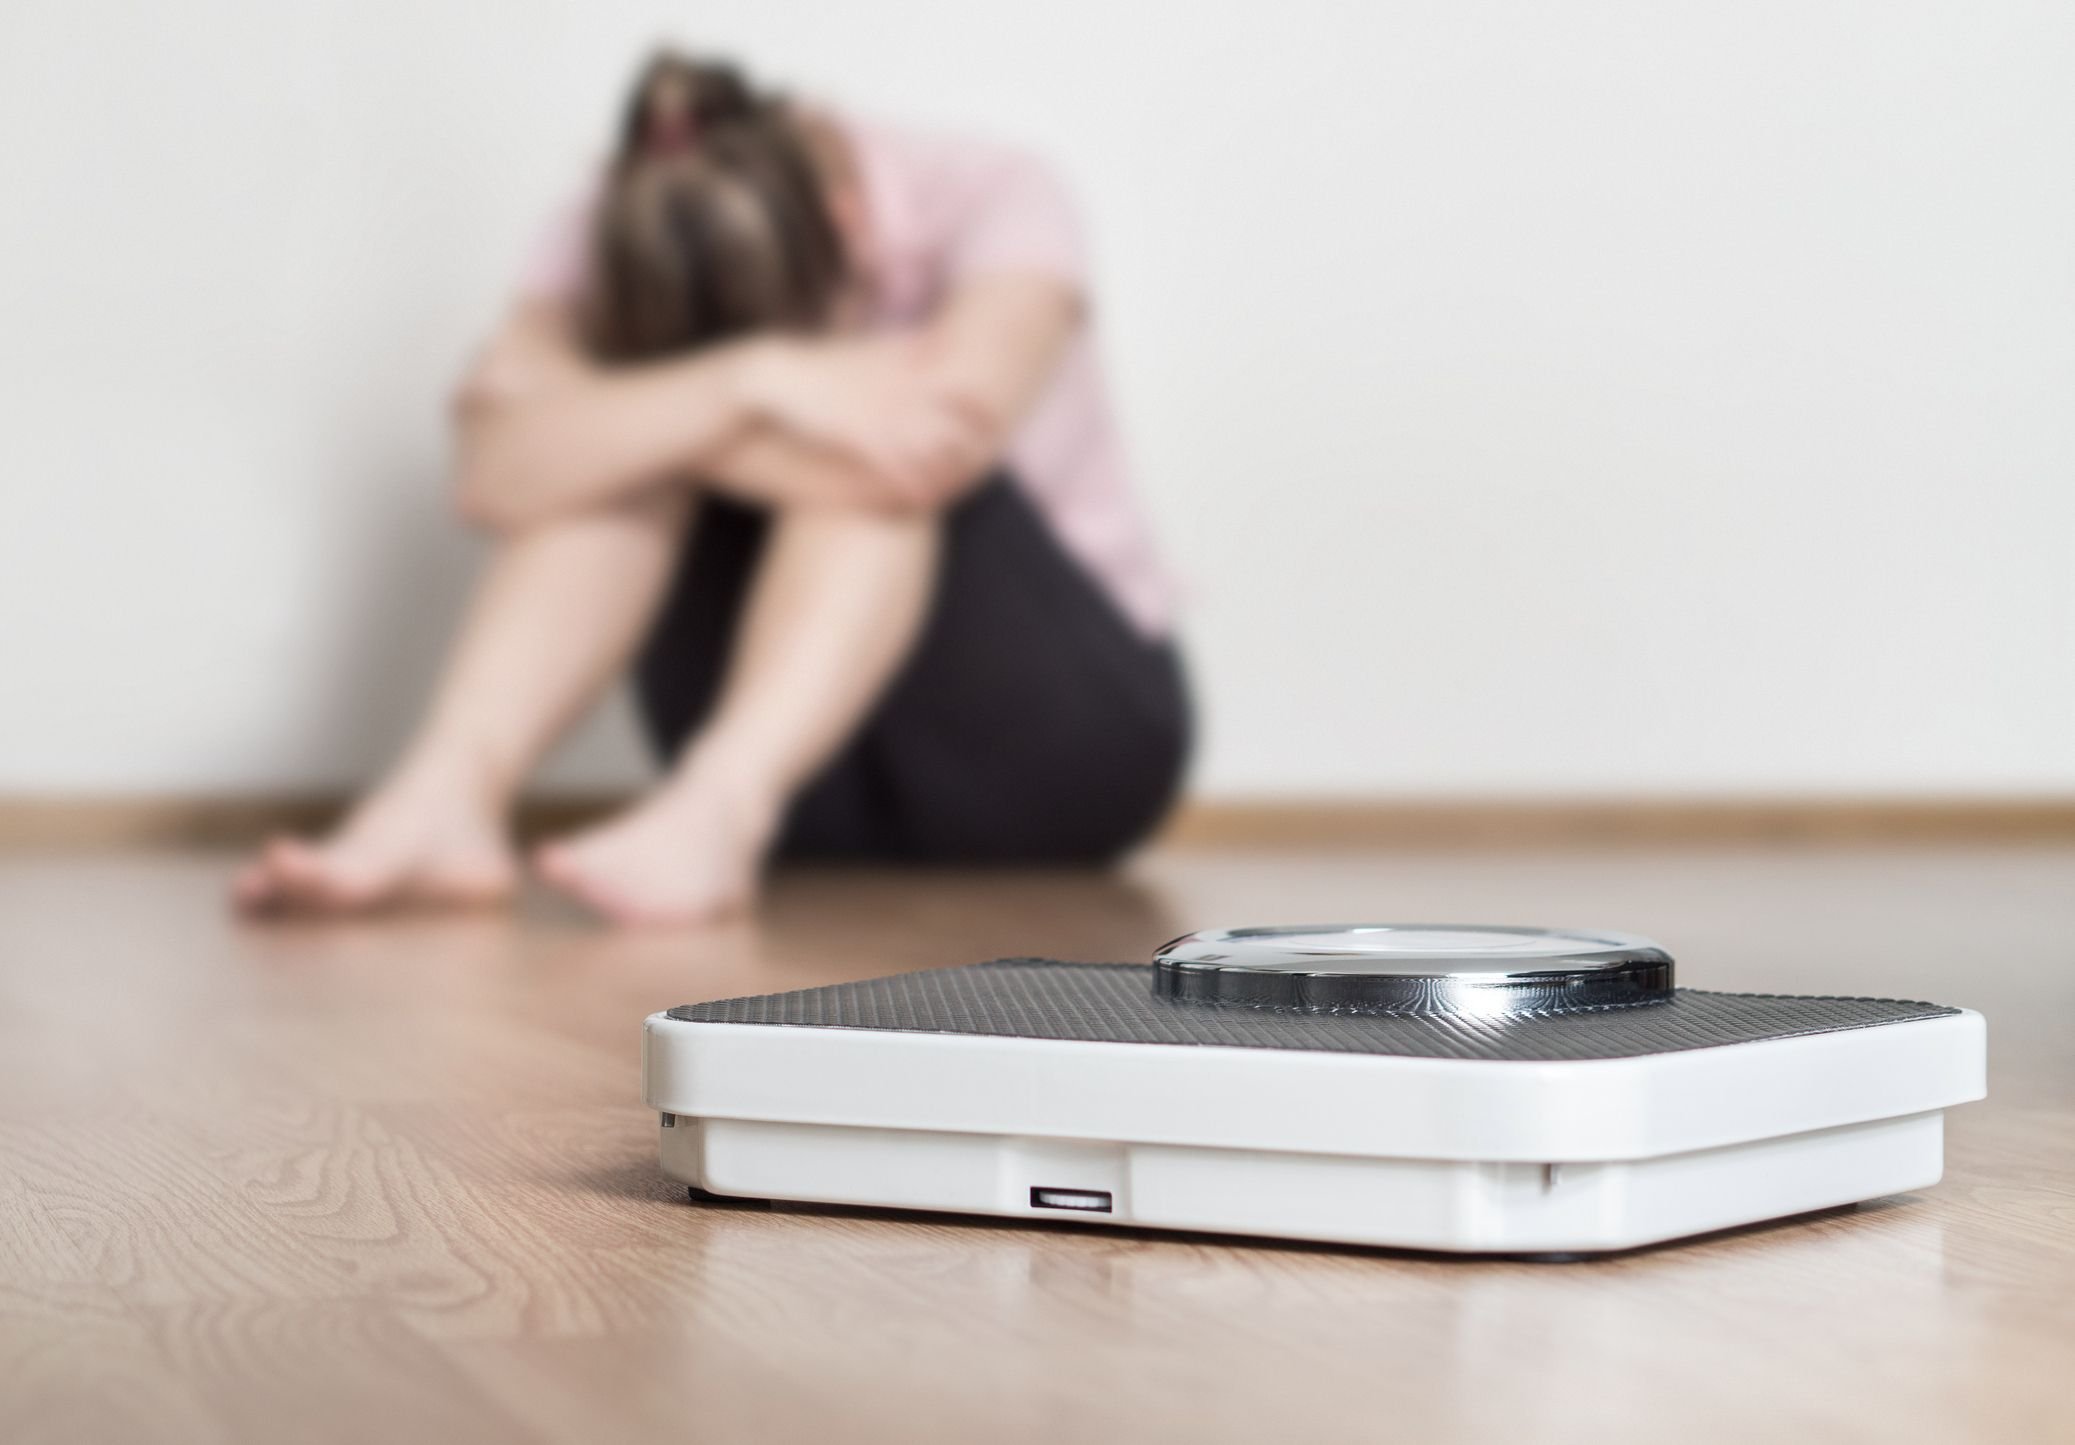 obsession de perte de poids